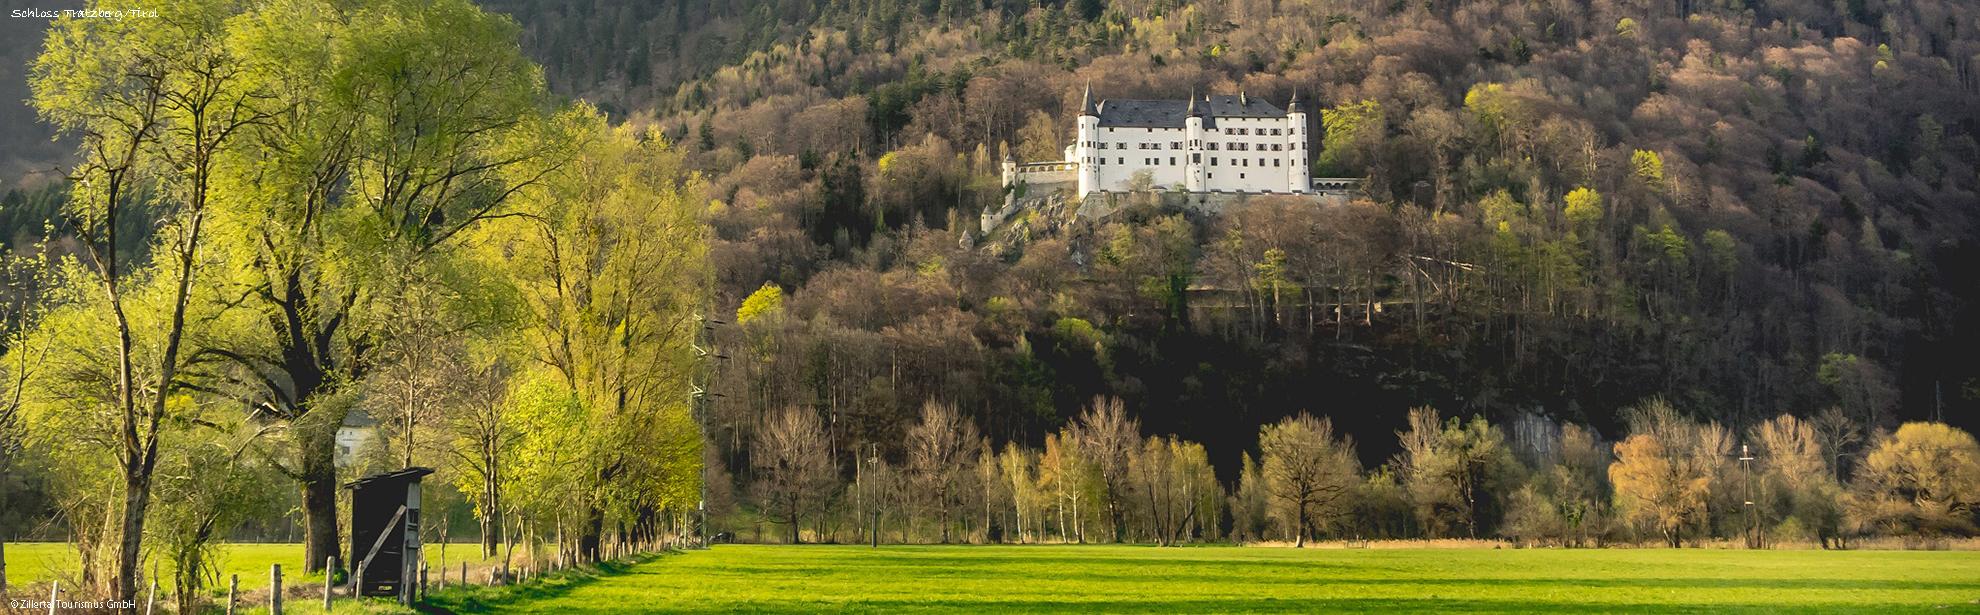 OZillertal-Tourismus-GmbH_Schloss-Tratzberg_2